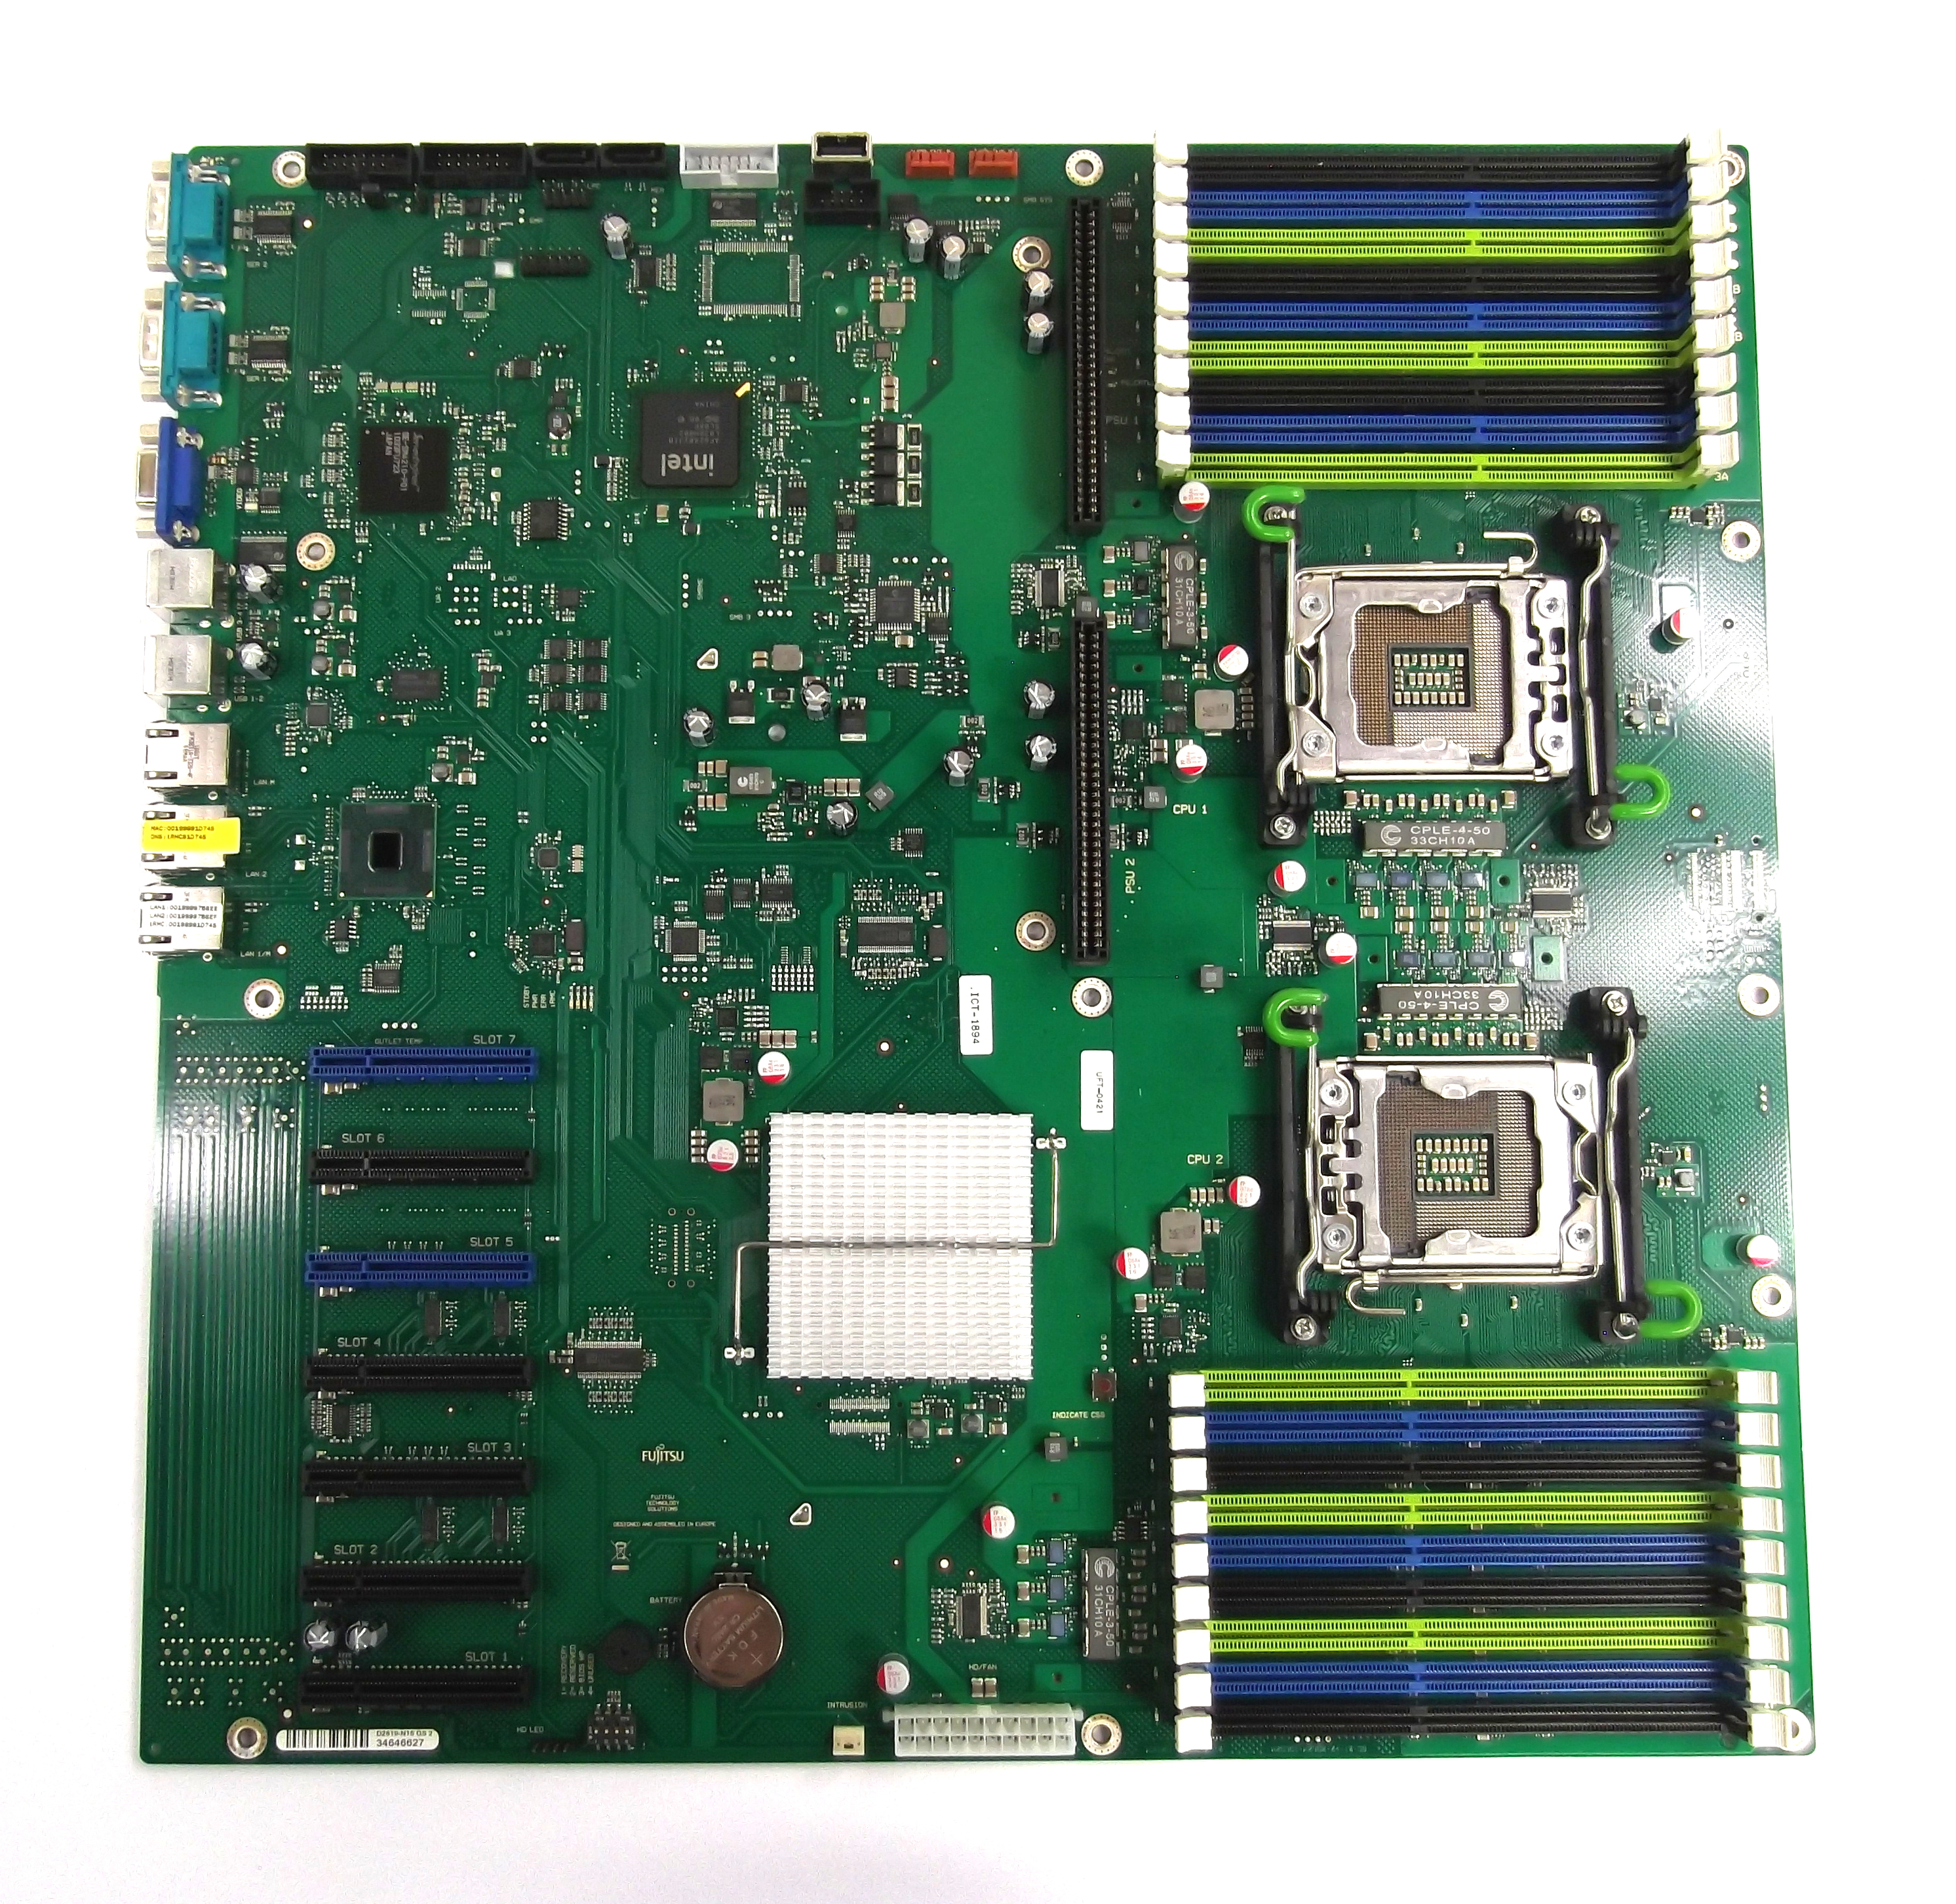 fujitsu primergy rx300 s6 manual